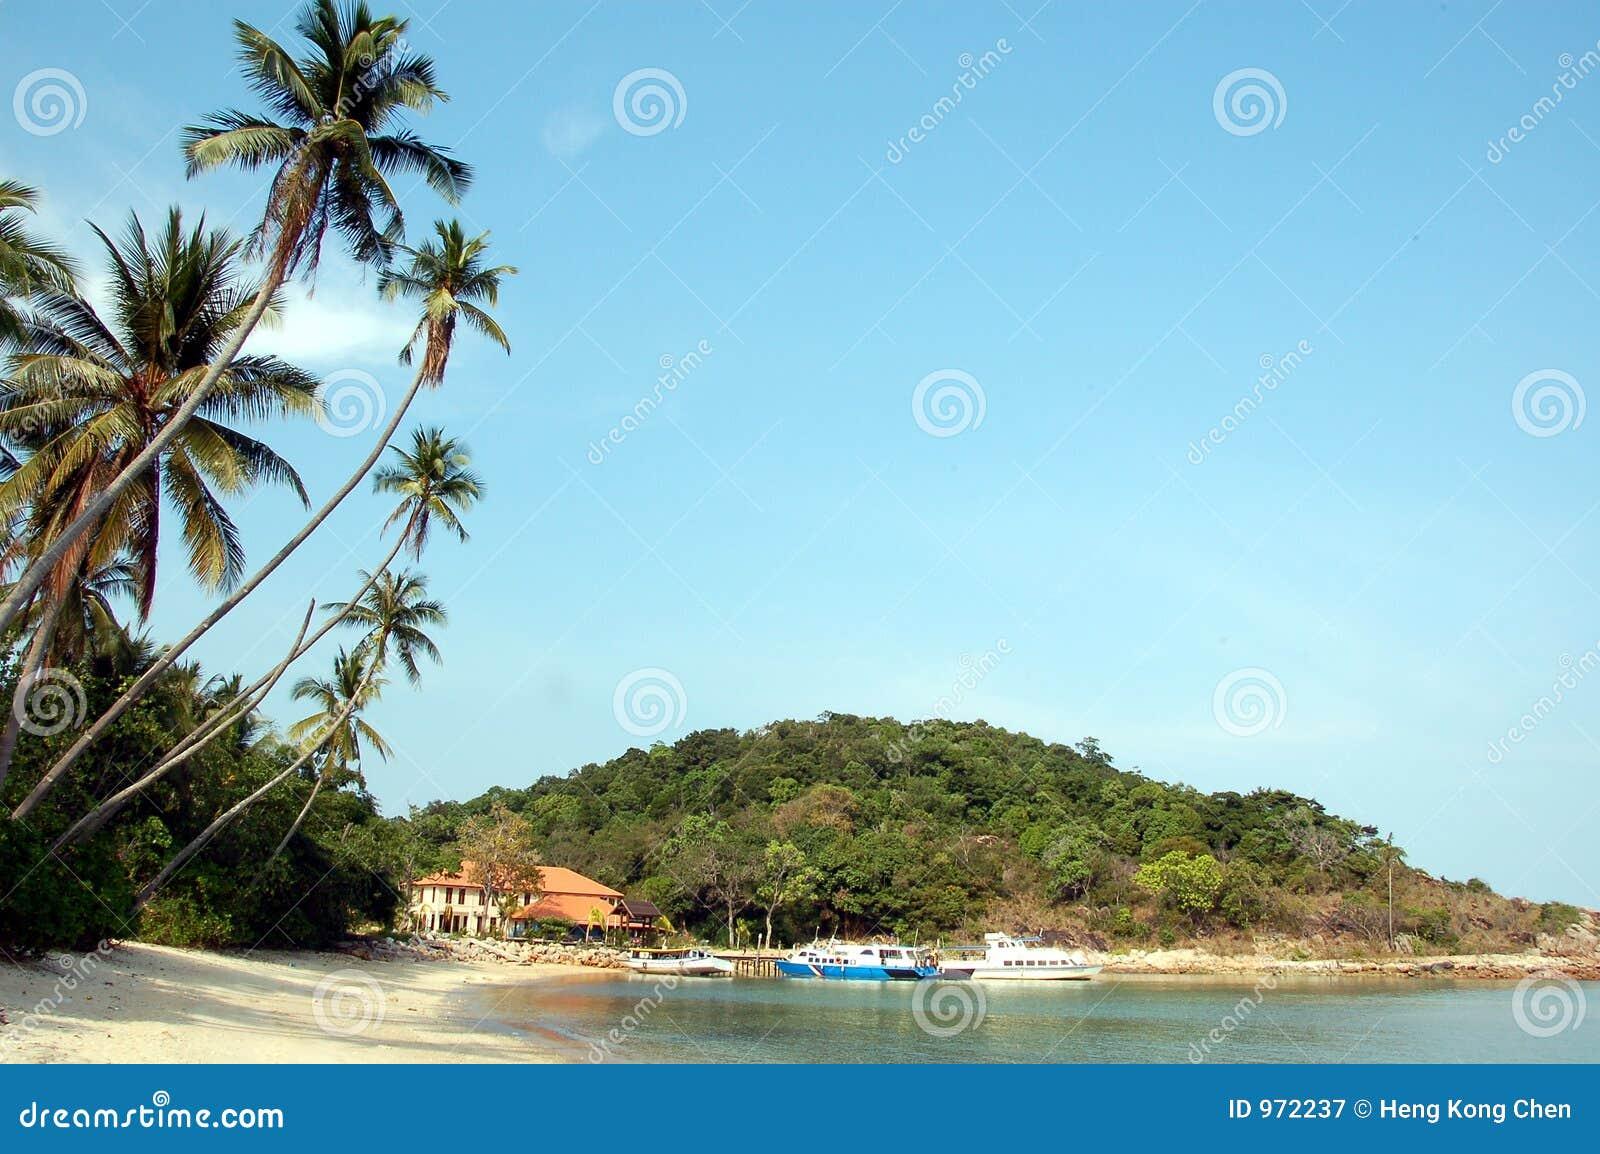 Anlegestelle der Inselrücksortierung